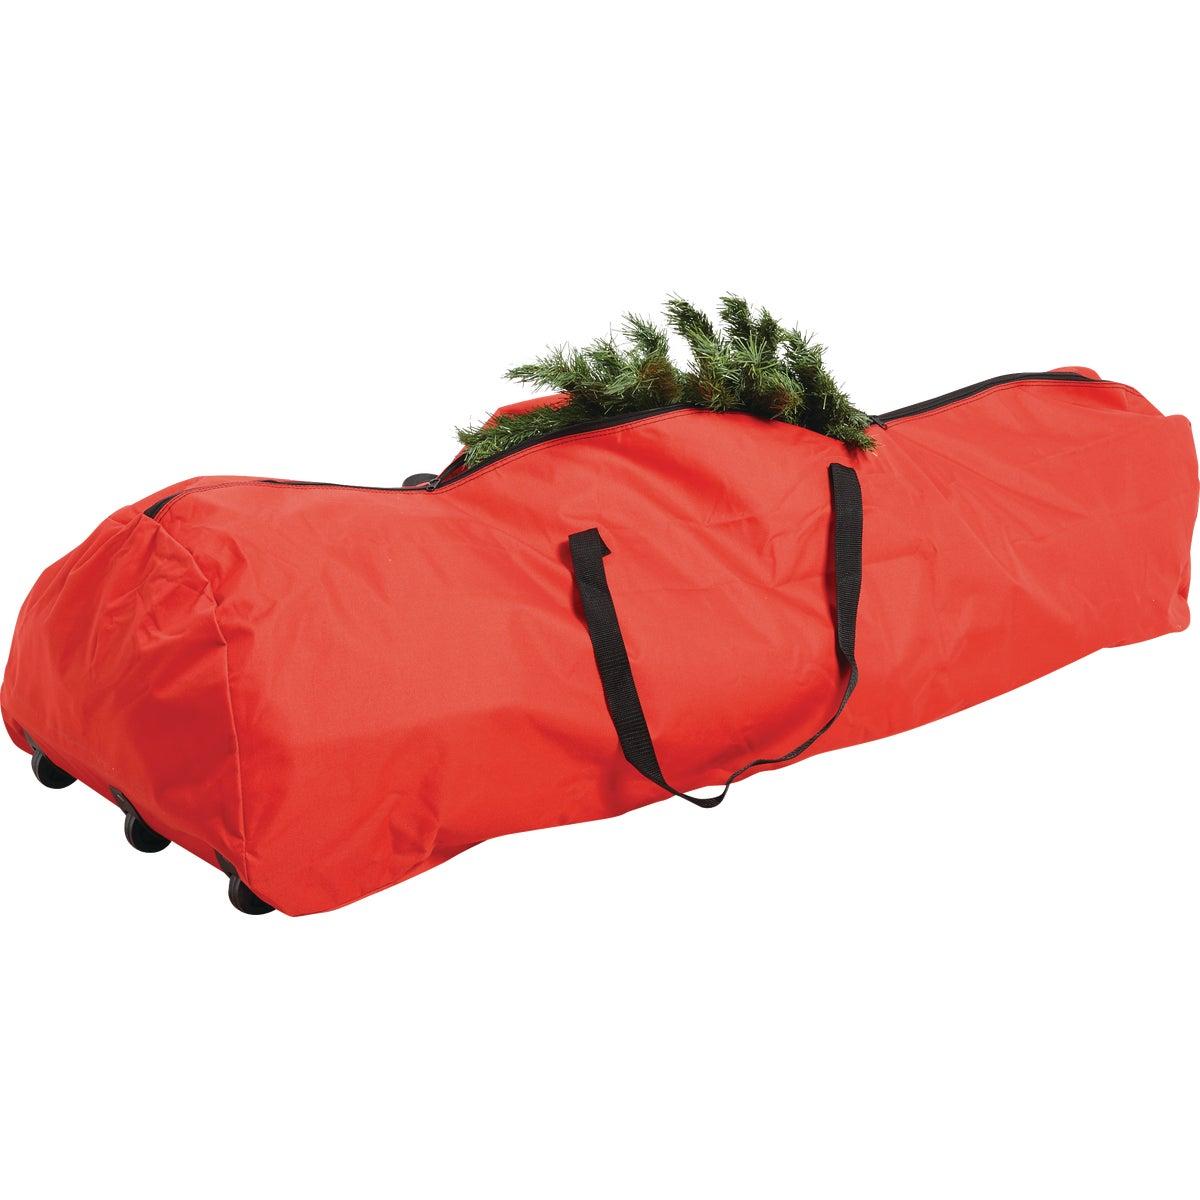 7.5' ROLLING TREE BAG